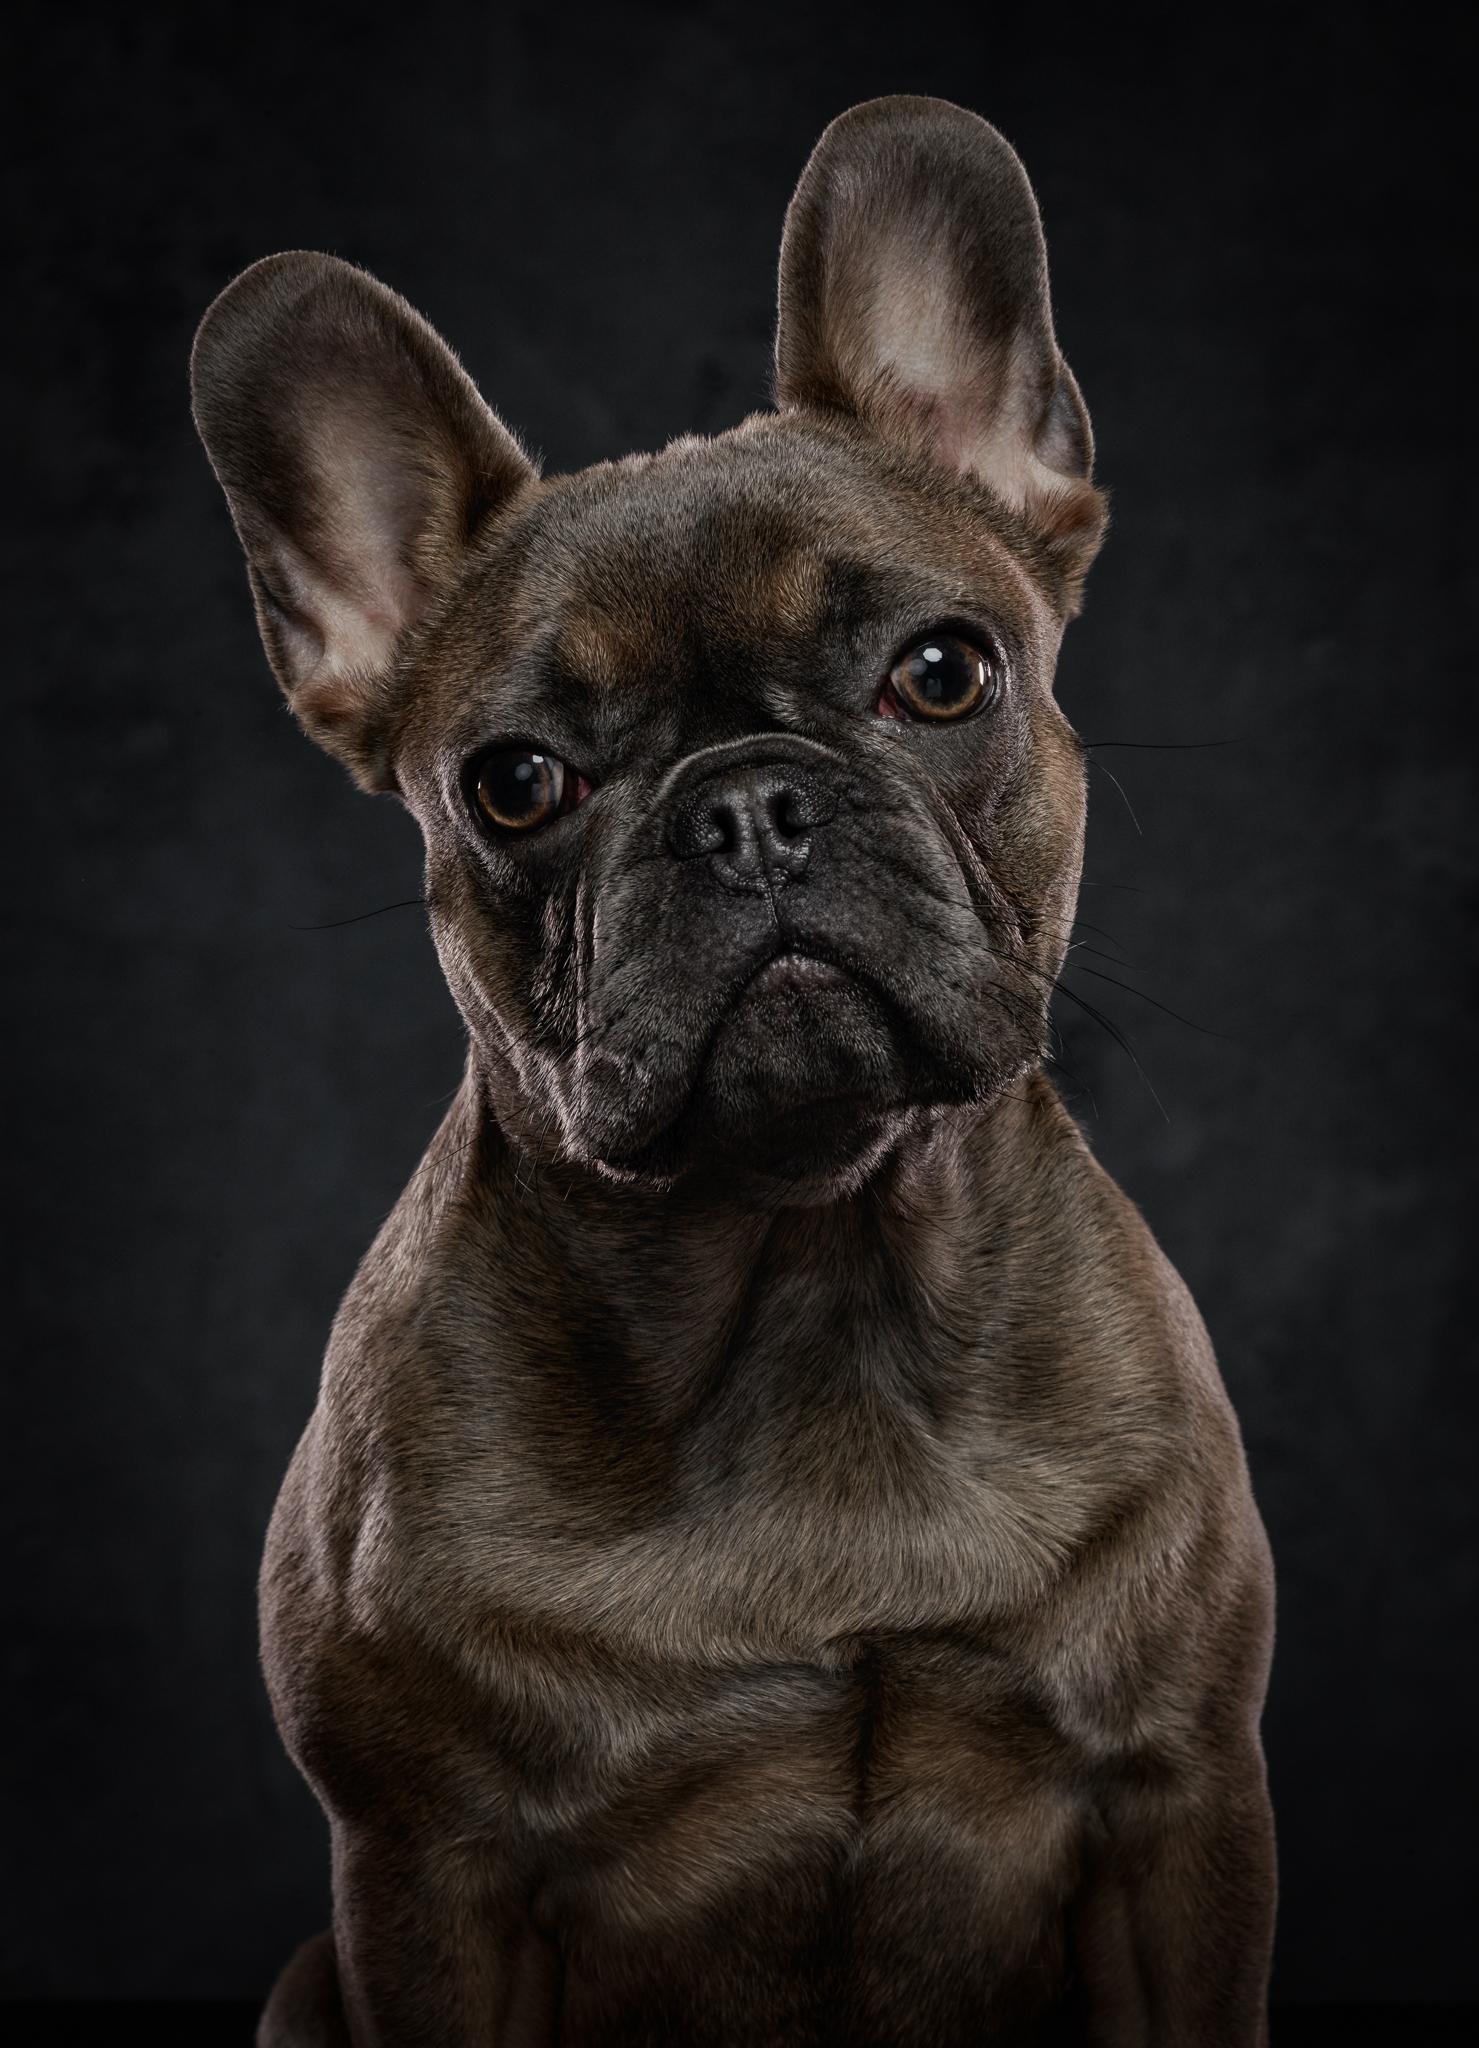 dog-photography-klaus-dyba-1.jpg